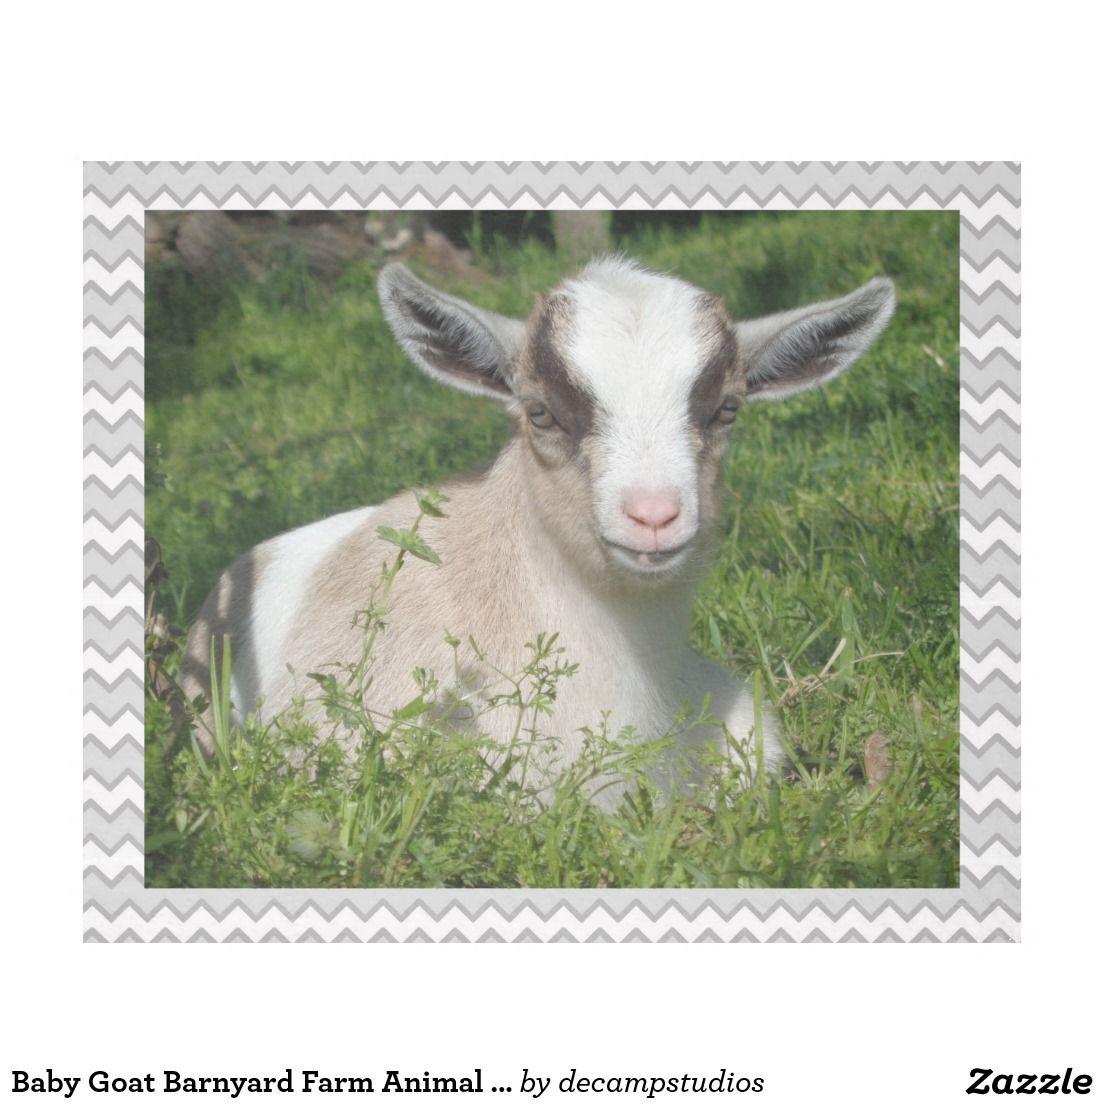 8b76a5b178 Baby Goat Barnyard Farm Animal Grey Gray Chevron Fleece Blanket   decampstudios